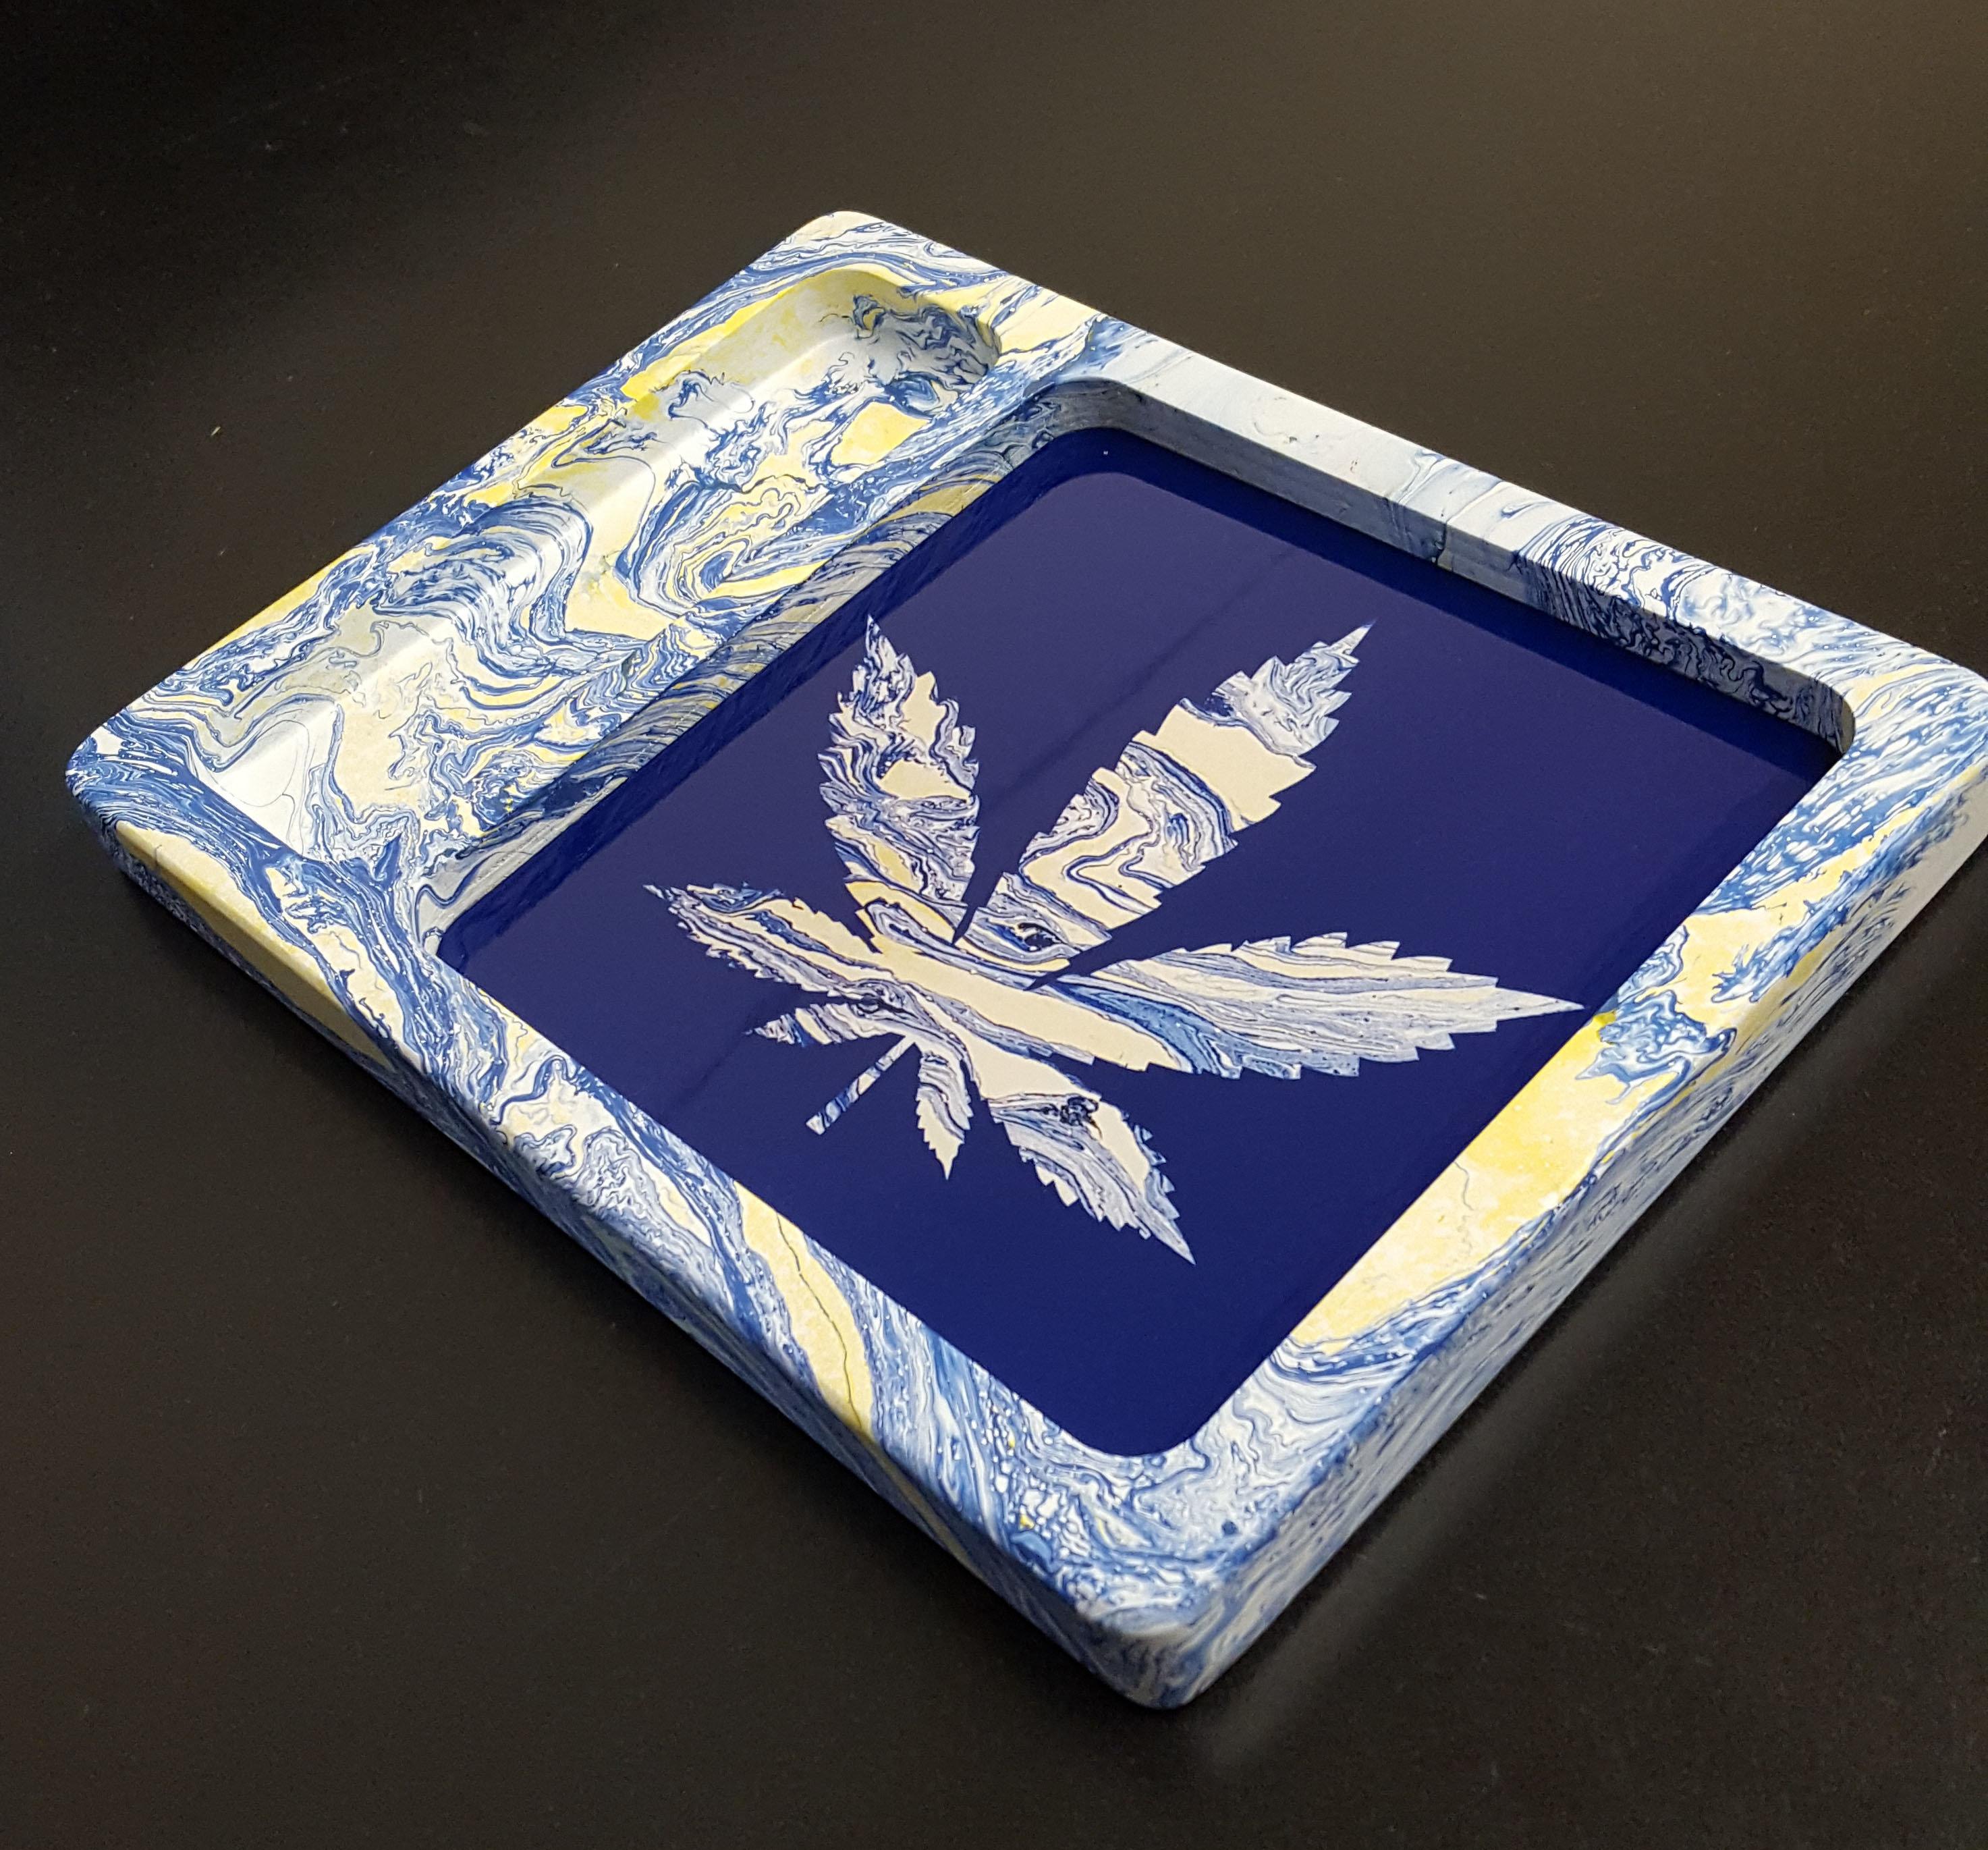 Blue/Yellow Hydro Swirl Pot Leaf 8x6x1 SCRATCH RESISTANT PAINT!